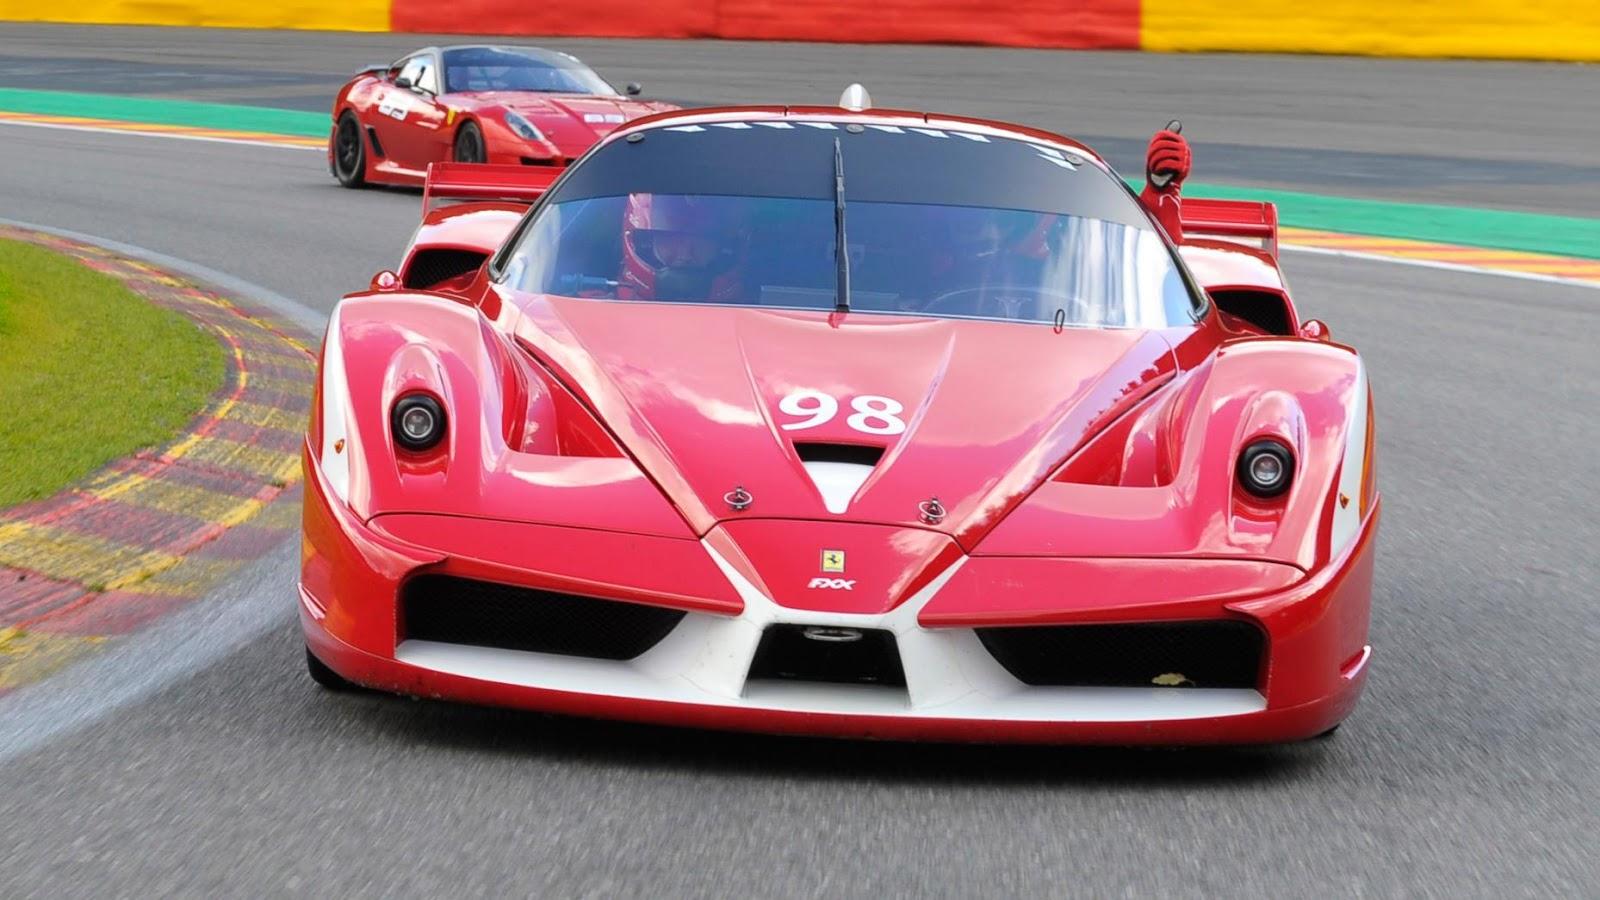 Ferrari FXX sức manh 808 mã lực